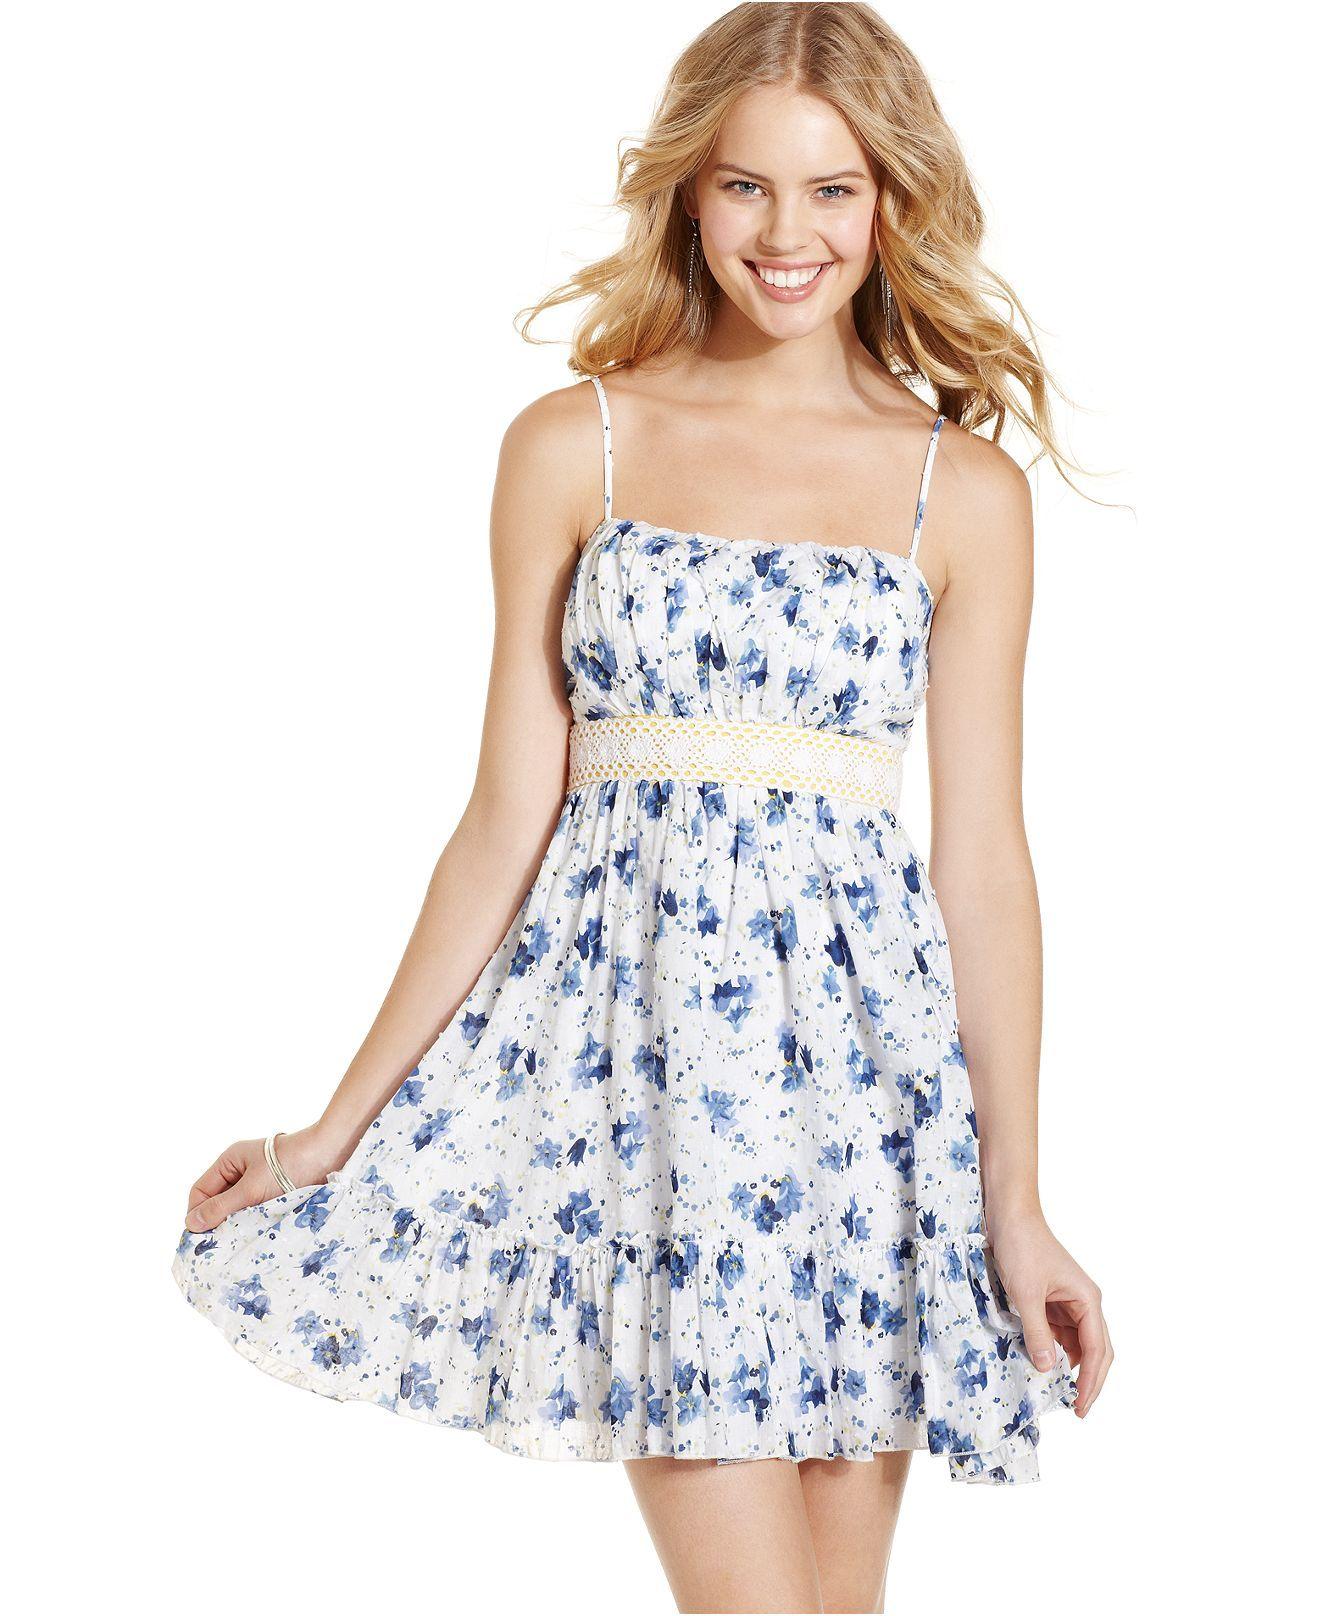 Trixxi Juniors Dress Sleeveless Floral Print A Line Juniors Dresses Macy S Dresses Junior Dresses Trixxi Dress [ 1616 x 1320 Pixel ]